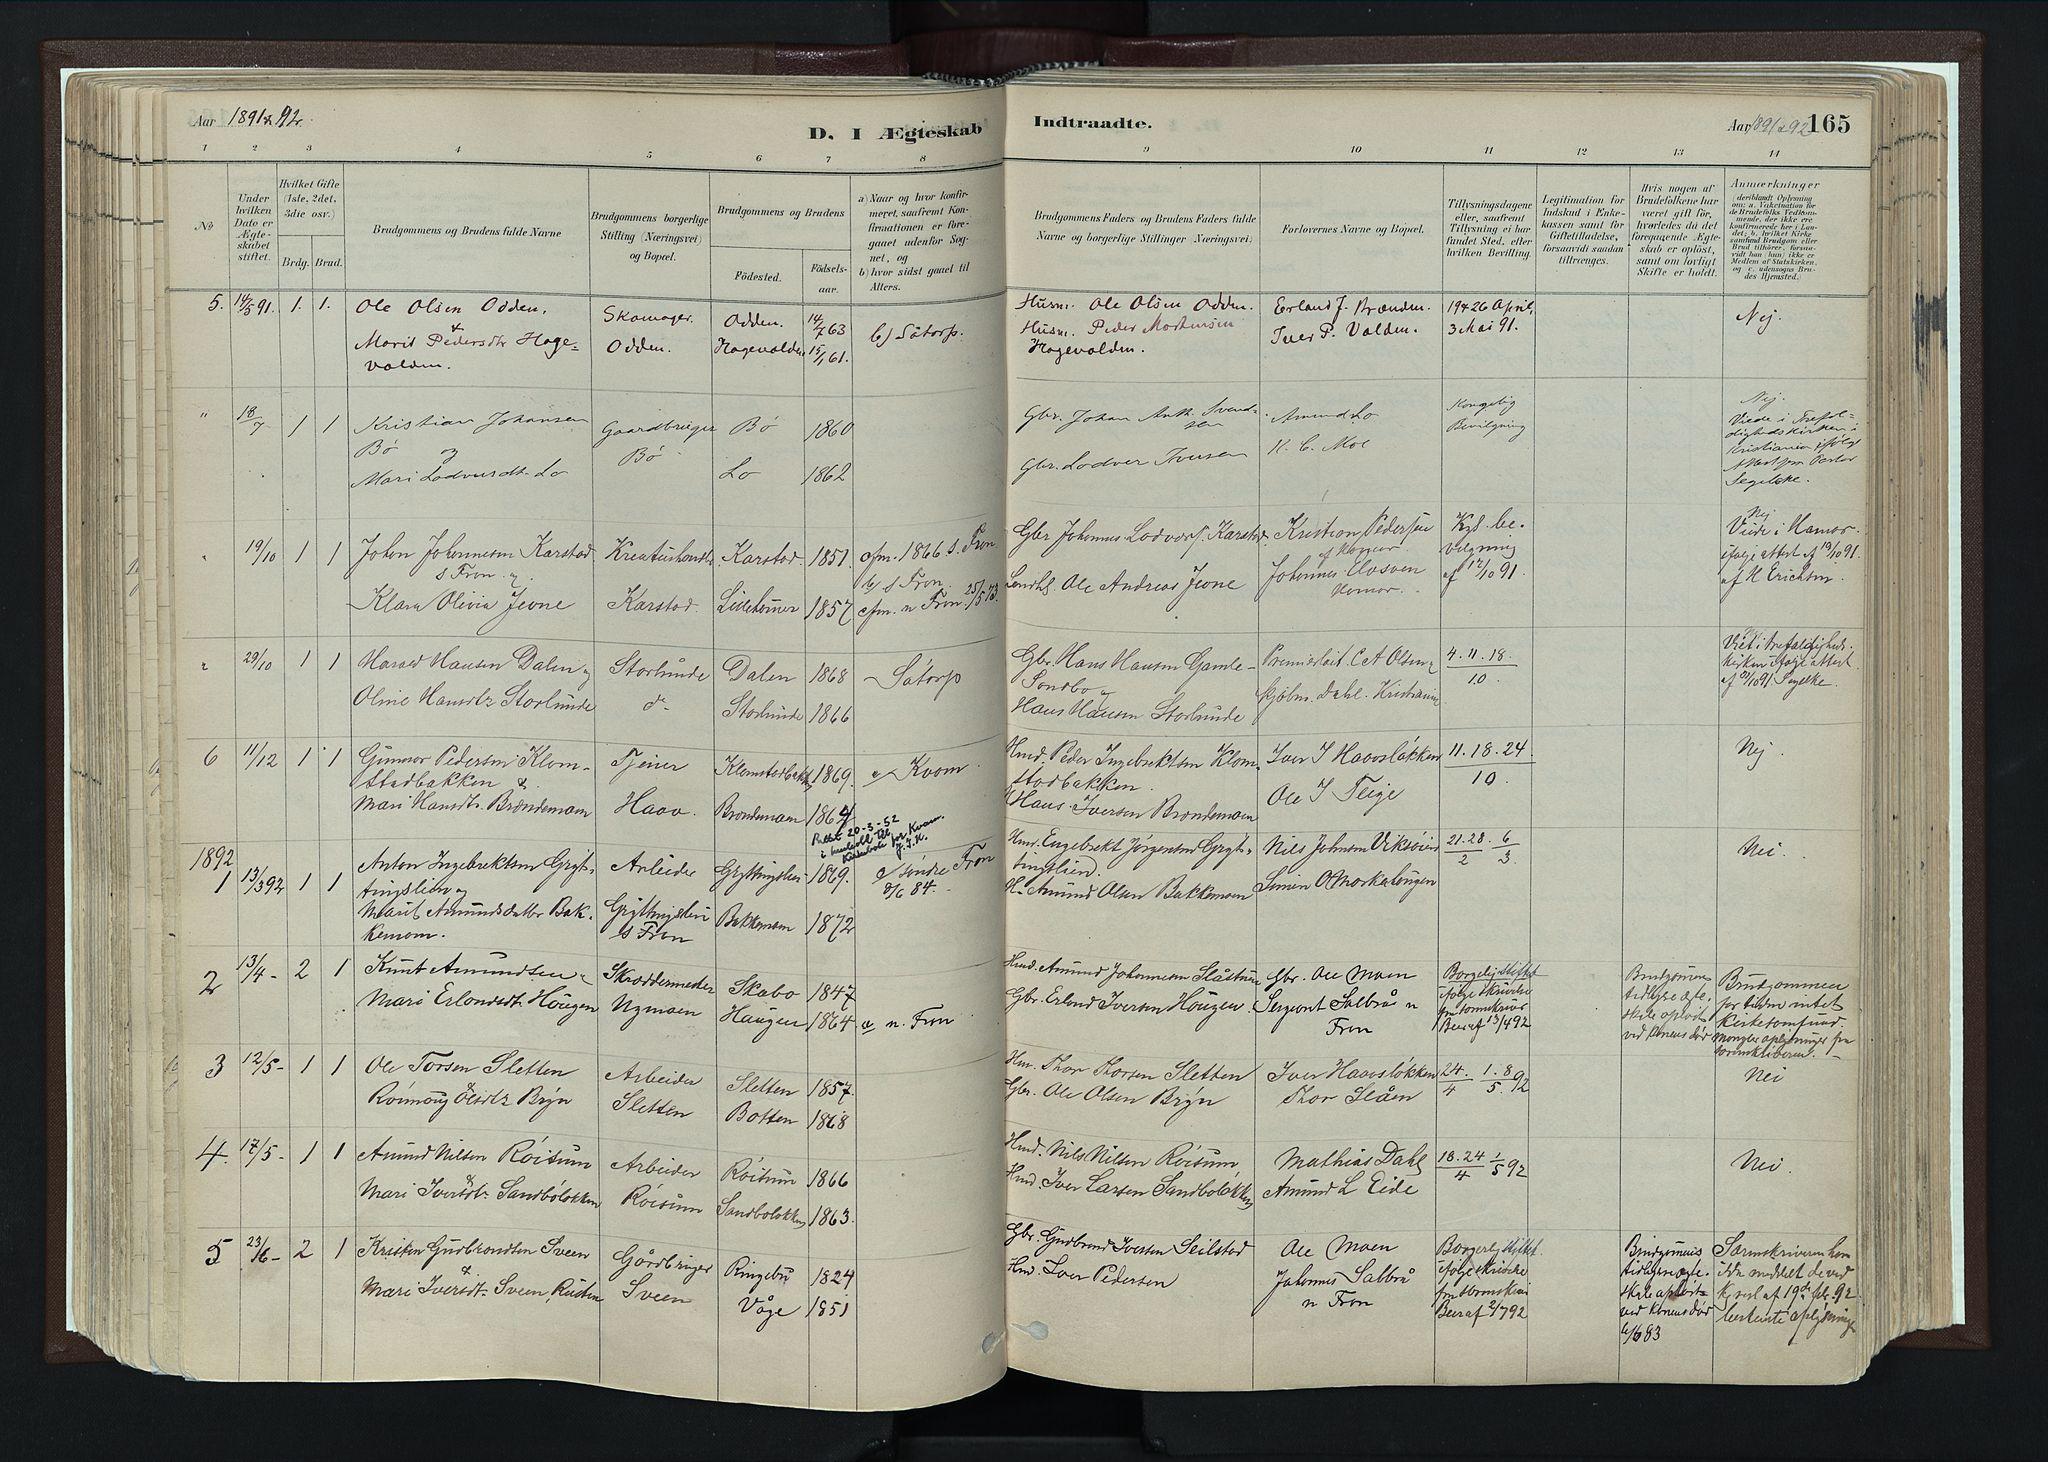 SAH, Nord-Fron prestekontor, Ministerialbok nr. 4, 1884-1914, s. 165